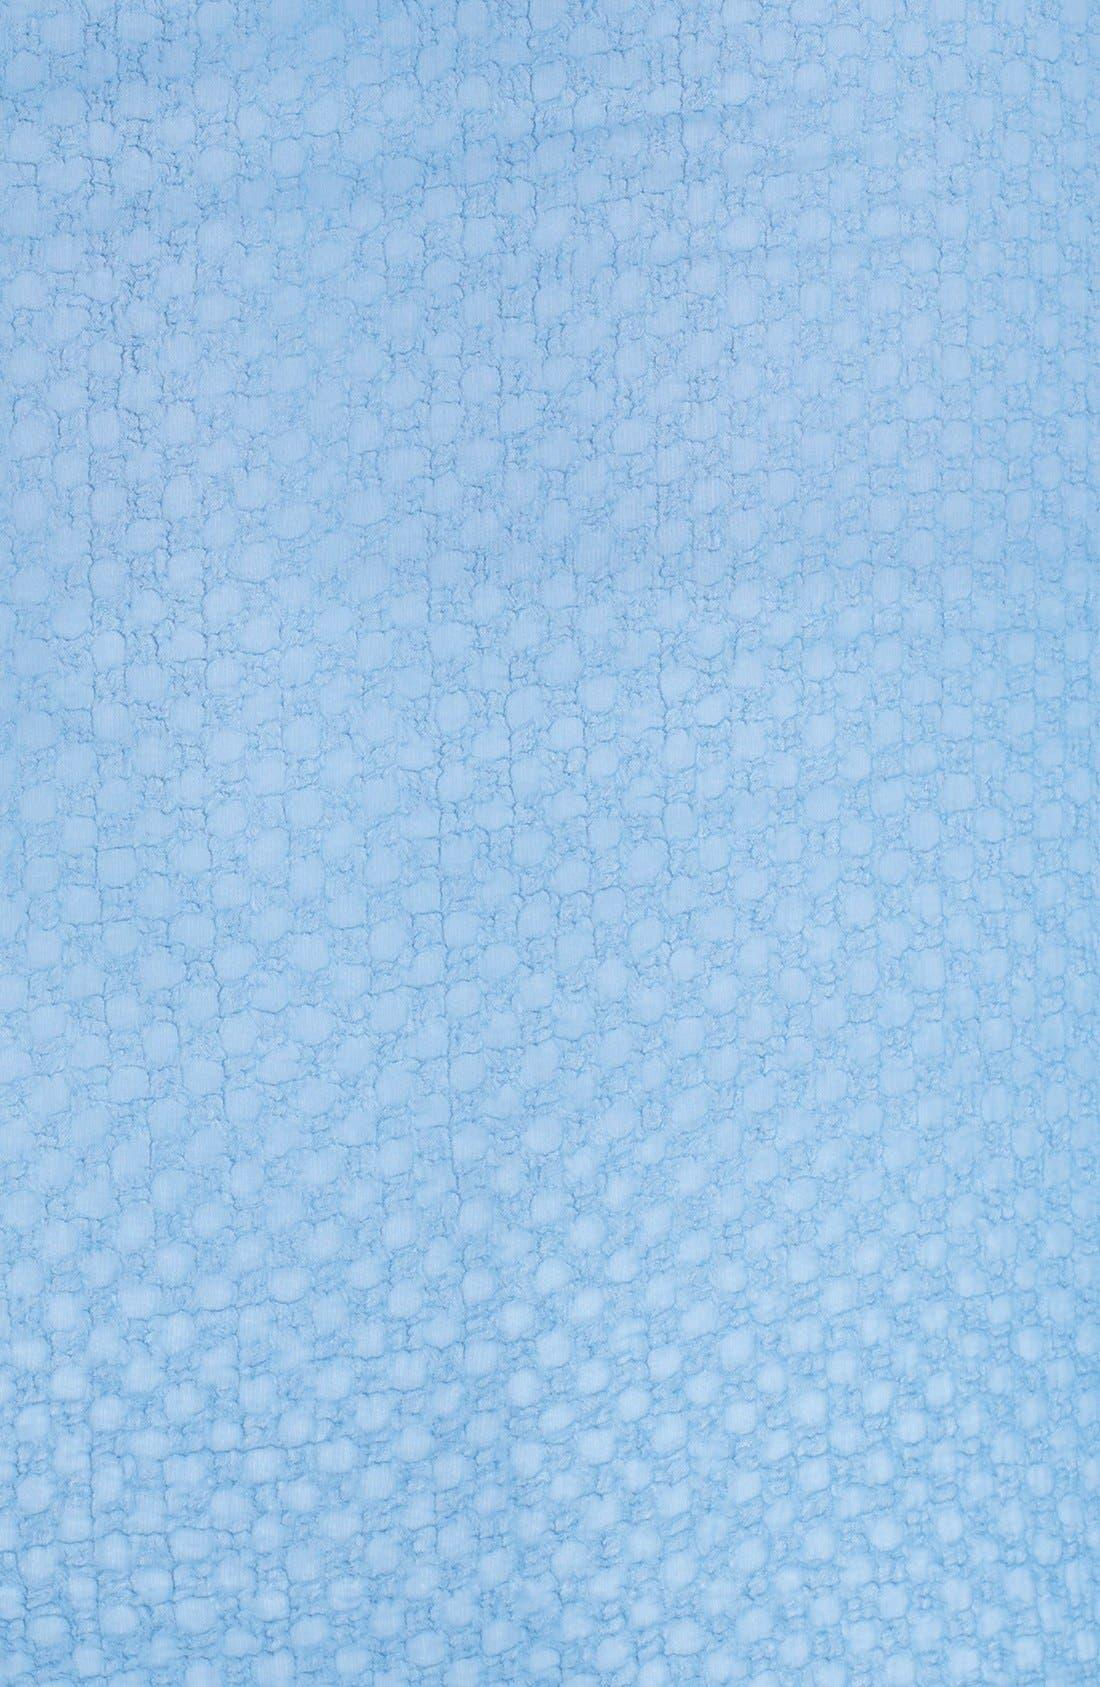 Alternate Image 3  - Pleione Textured Chiffon V-Neck Blouse (Plus Size)